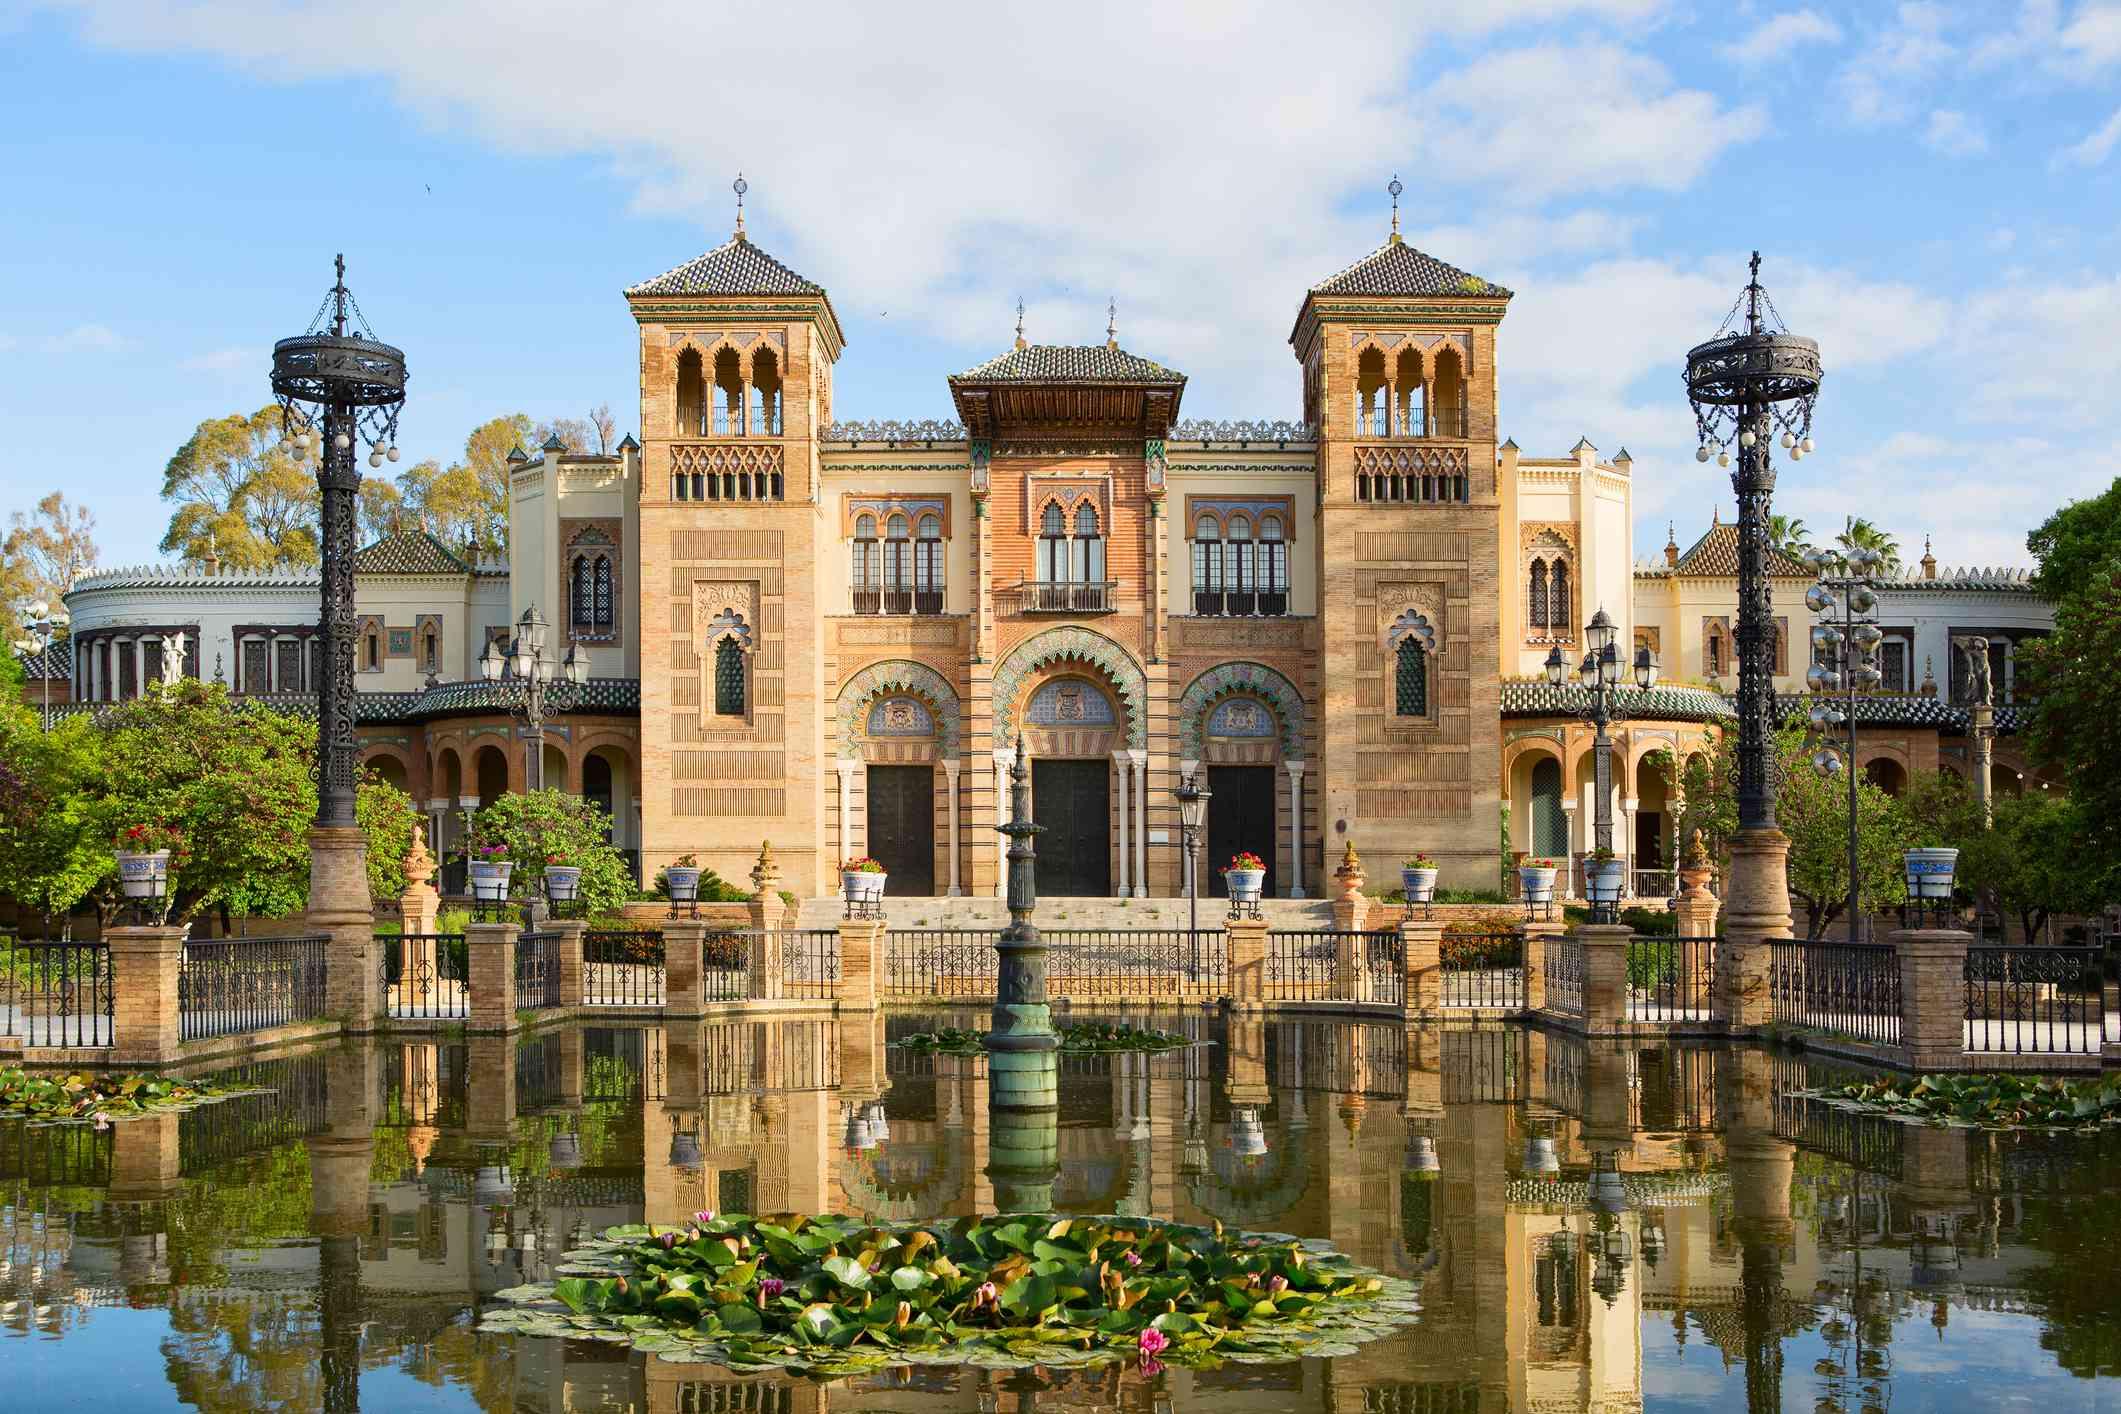 Plaza de America in the sunny morning, Parque de Maria Luisa, Seville, Andalusia, Spain.